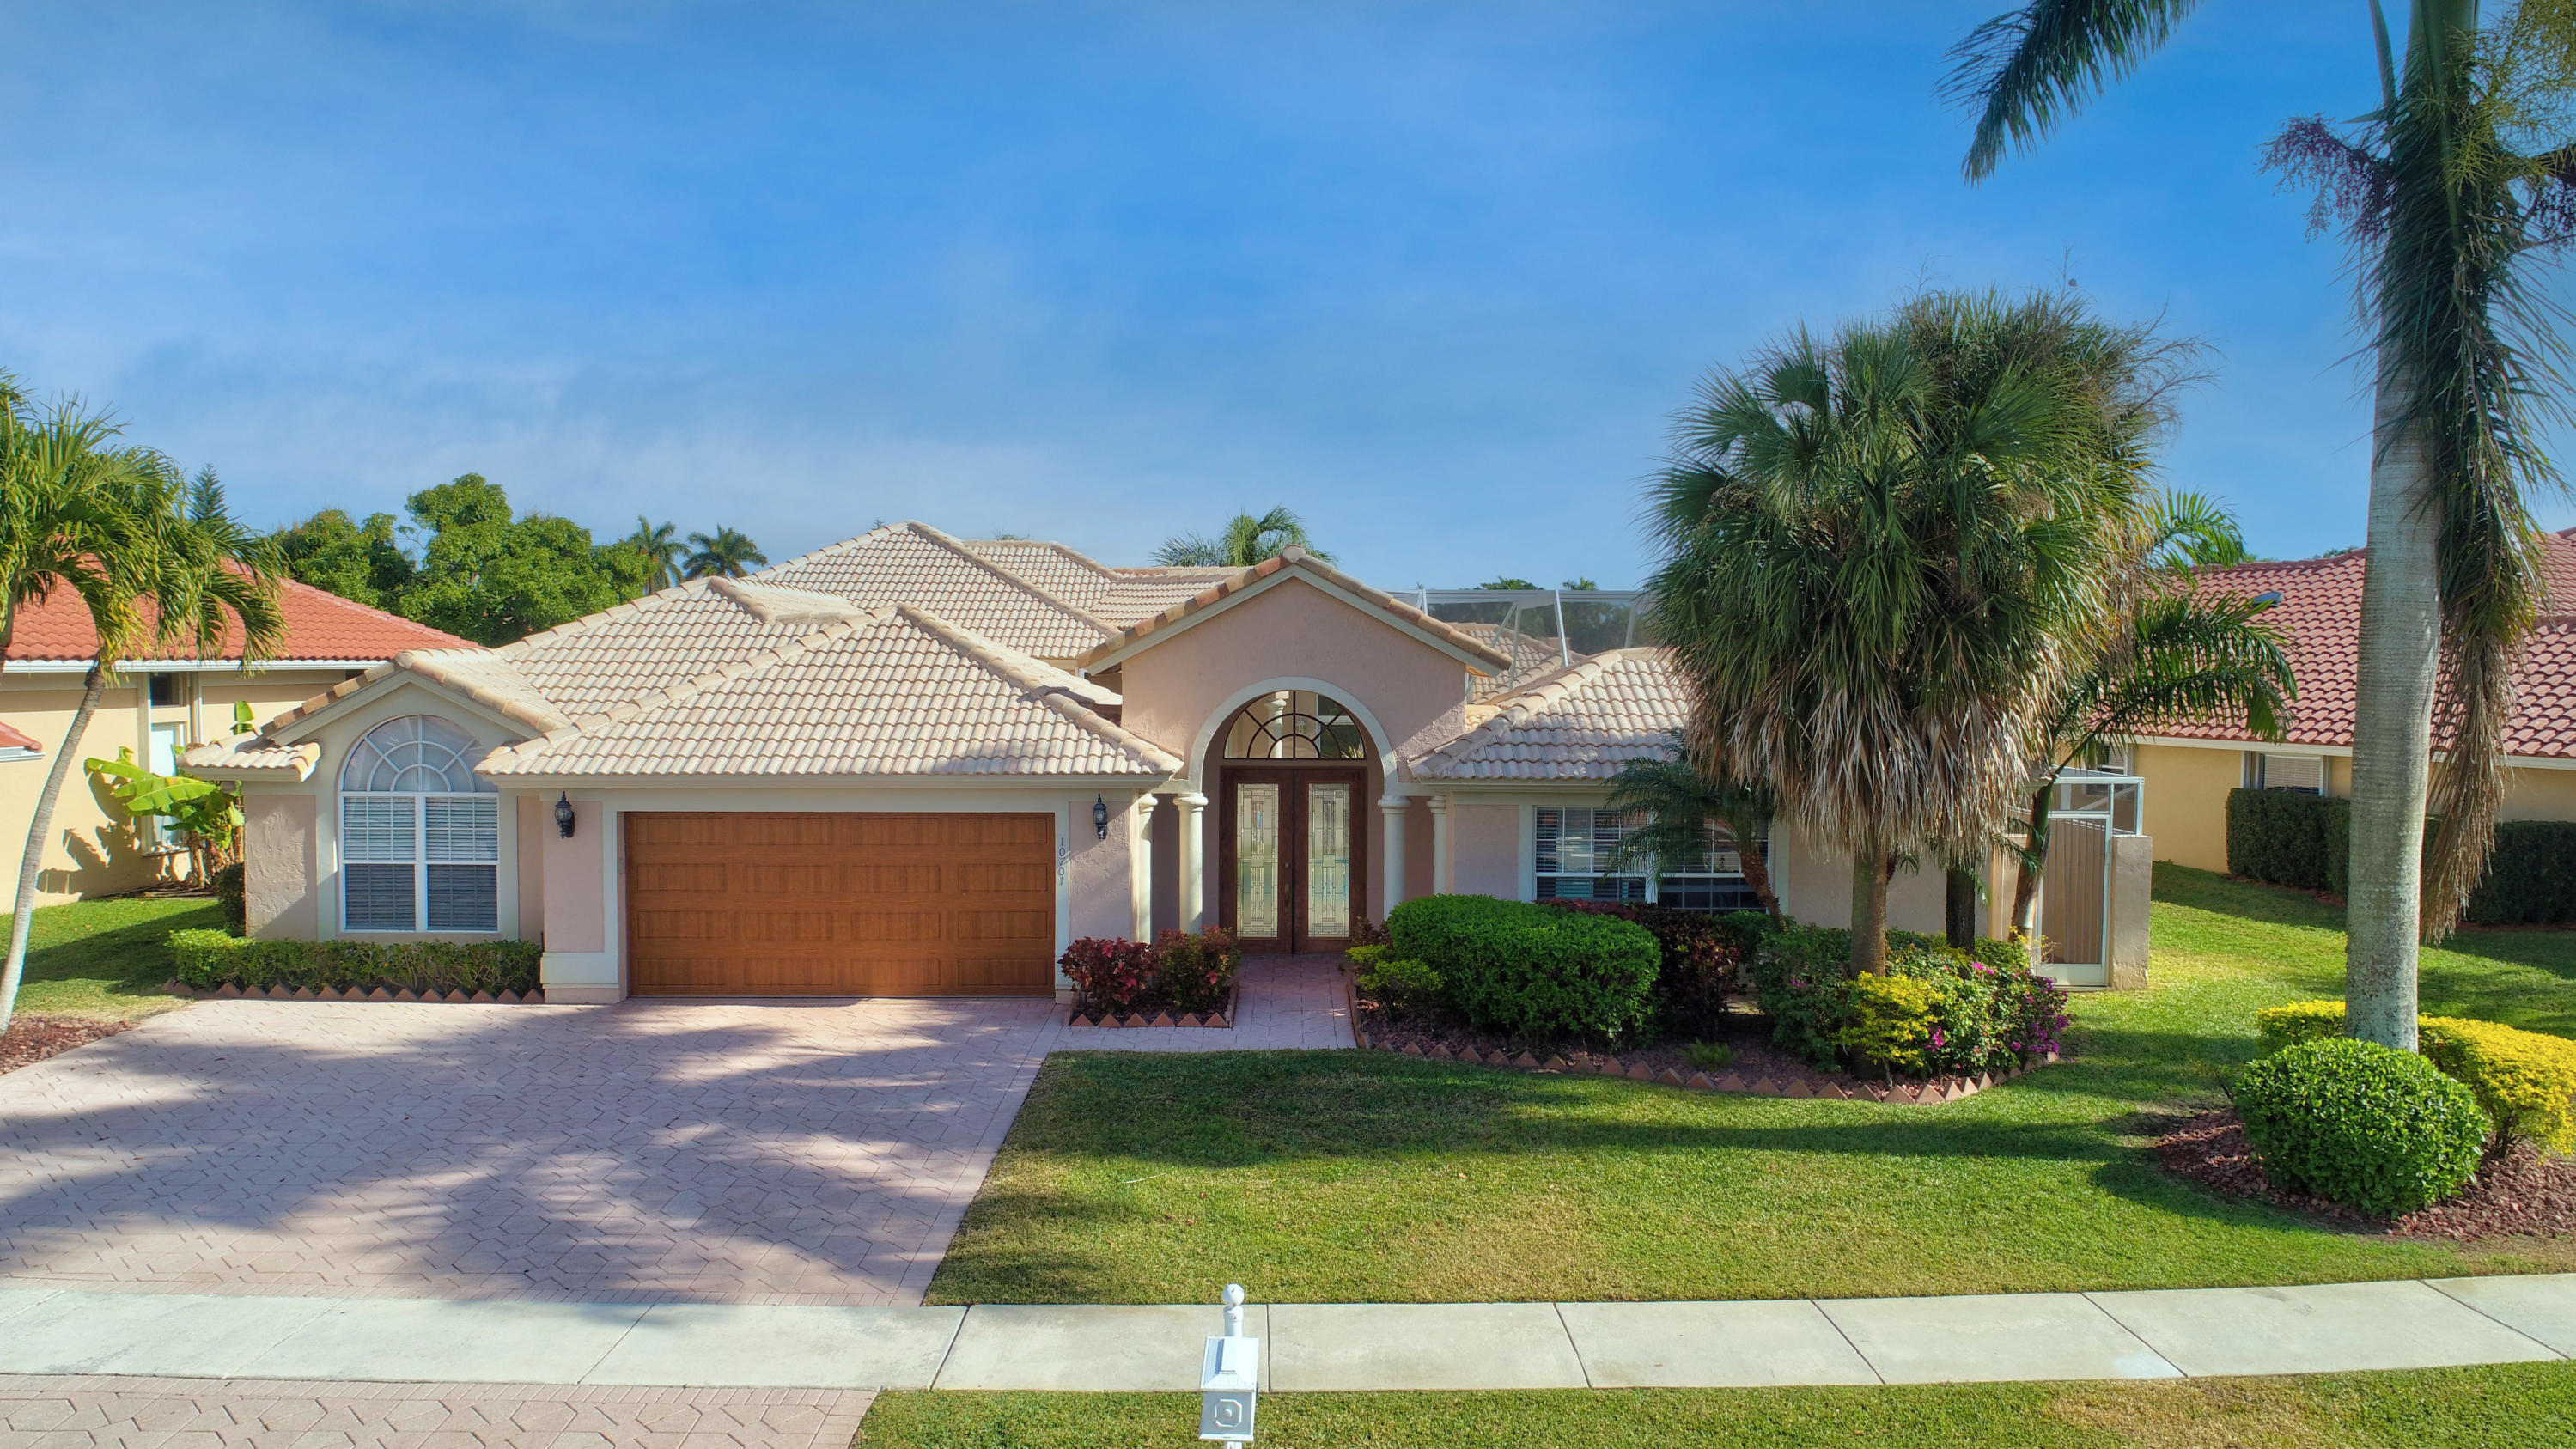 Photo of 10701 Maple Chase Drive, Boca Raton, FL 33498